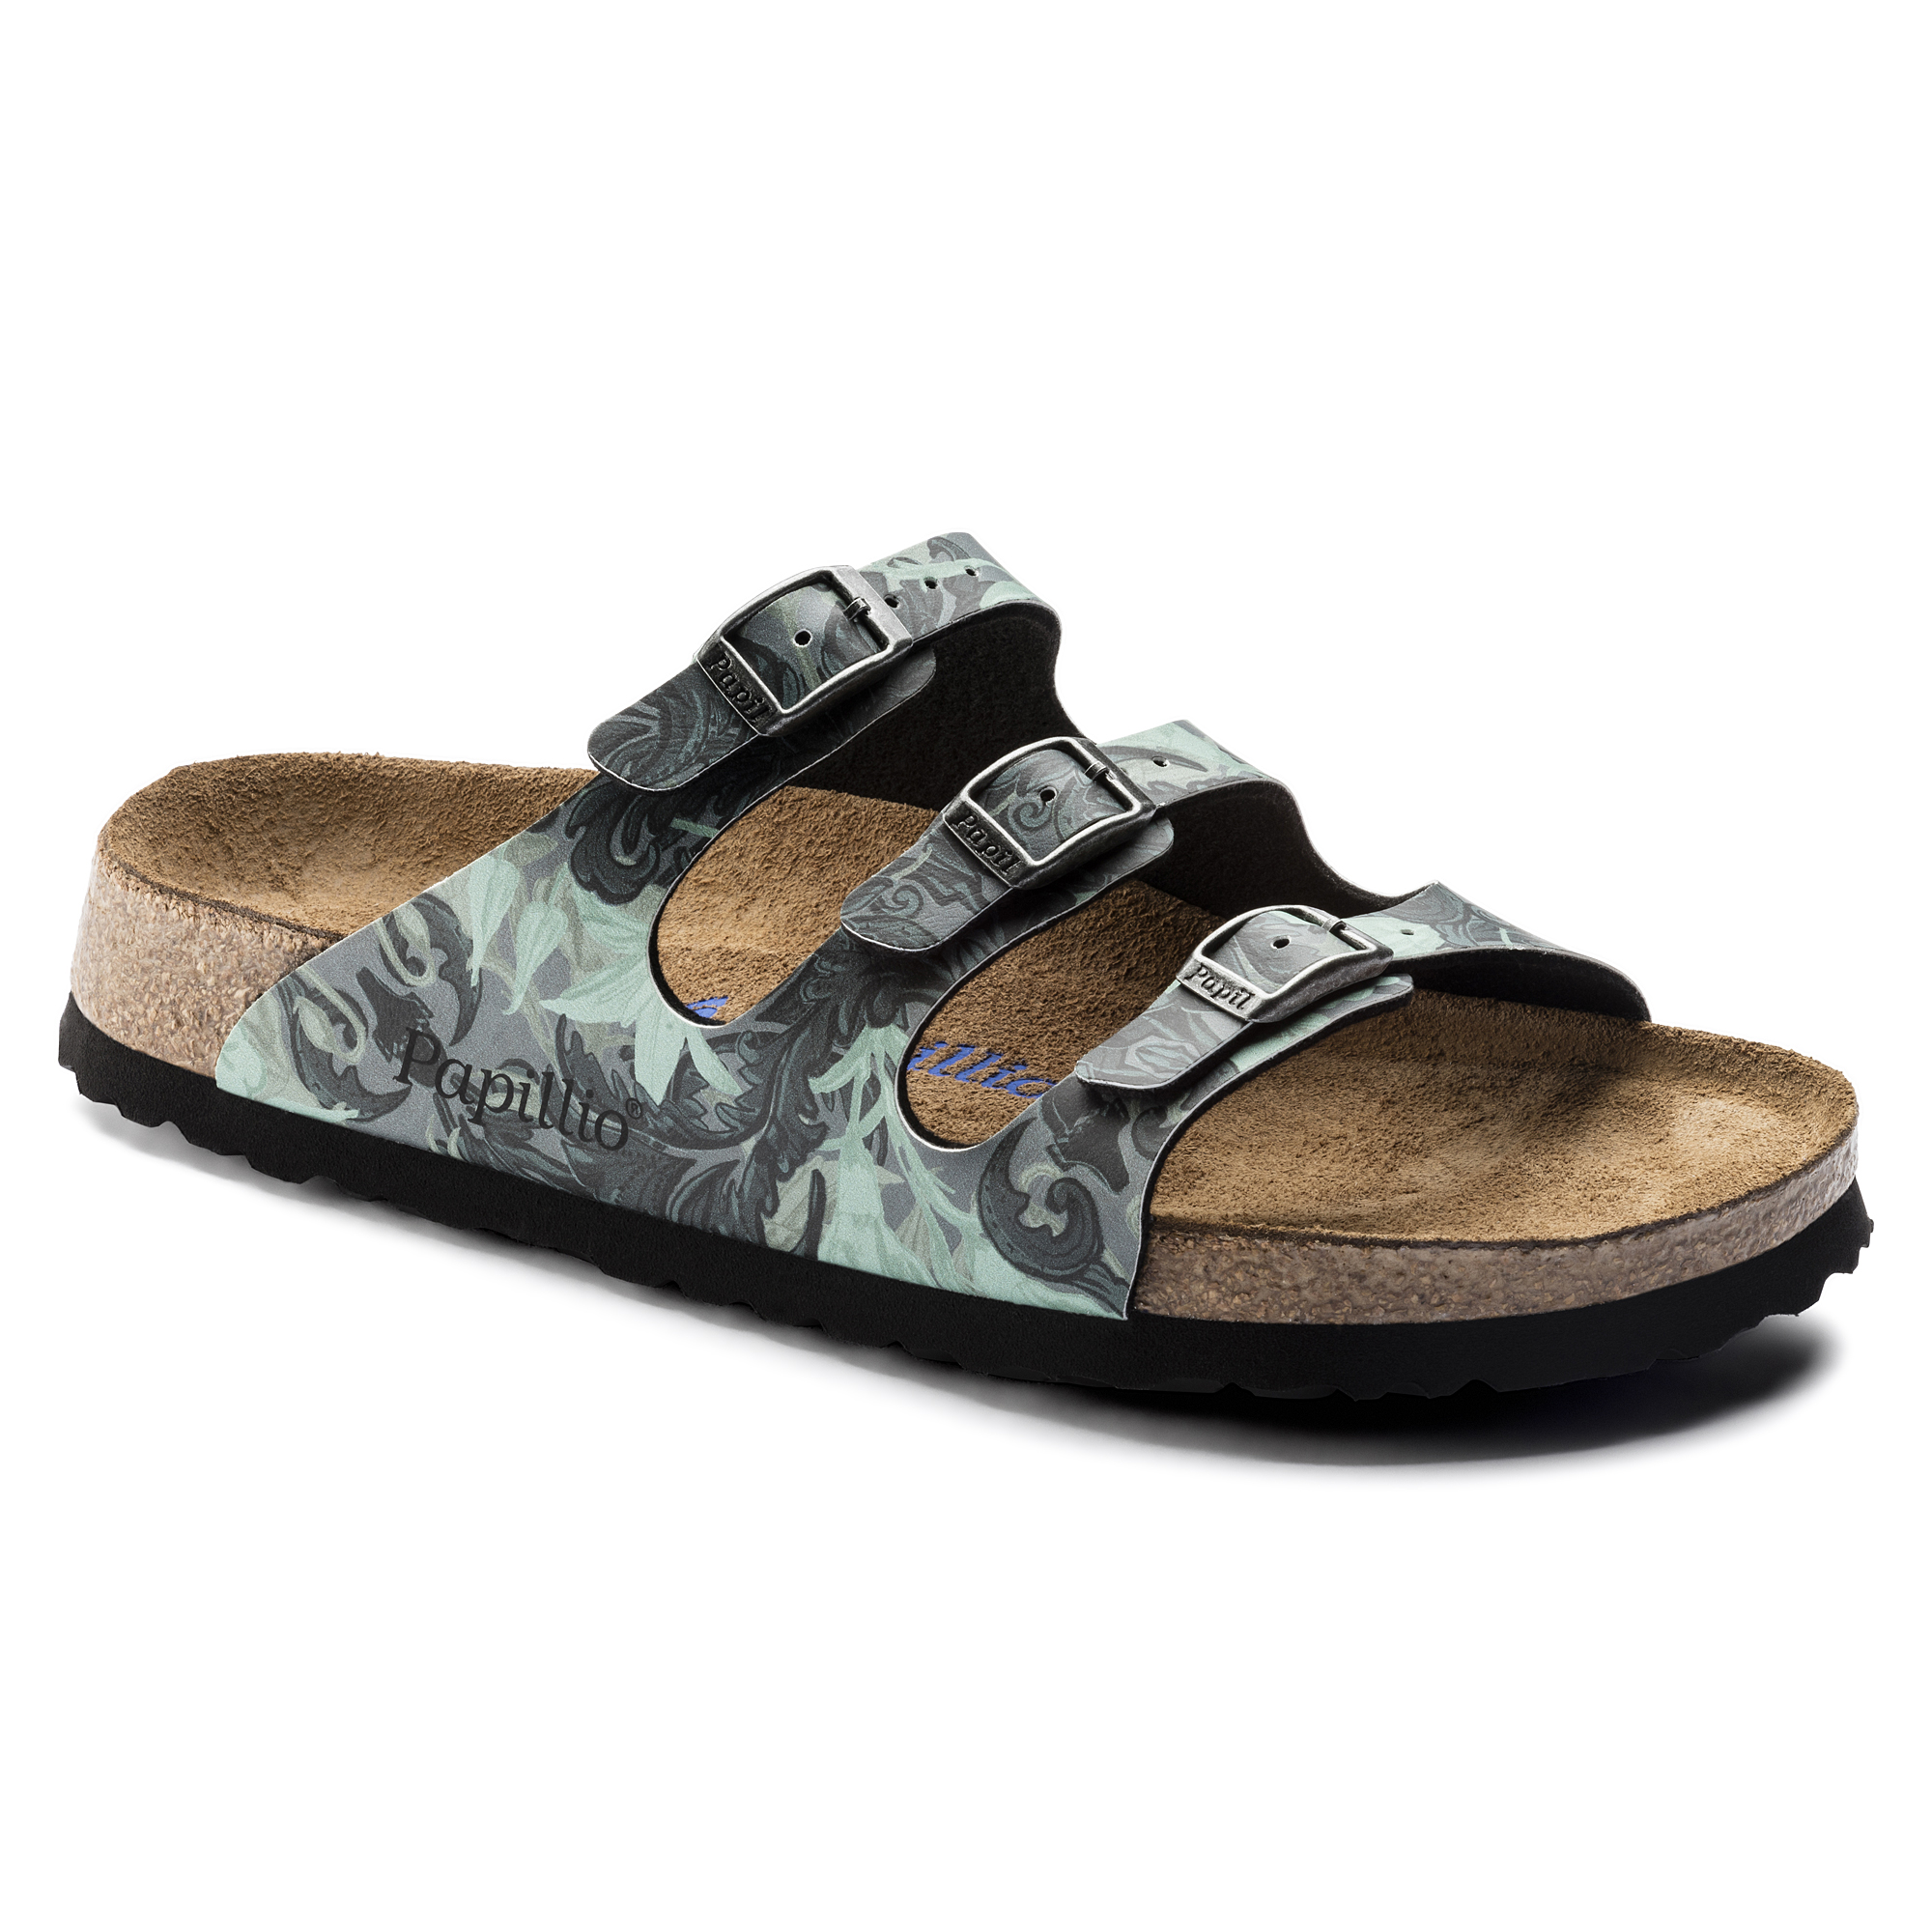 Birkenstock Gizeh Canada Review Shoe Outlets Near Me  93dfe1768ce